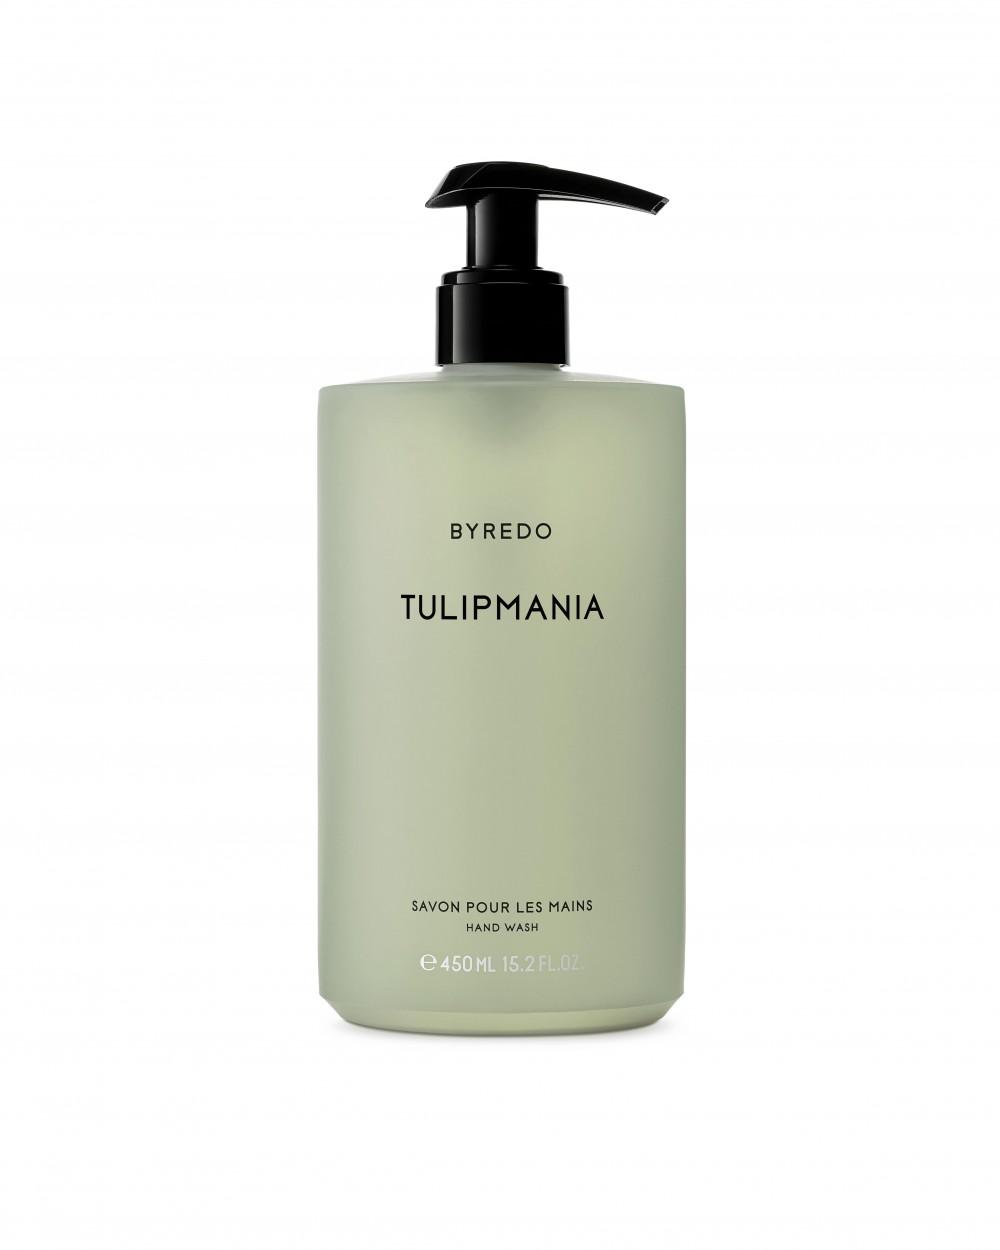 BYREDO Tulipmania洗手液